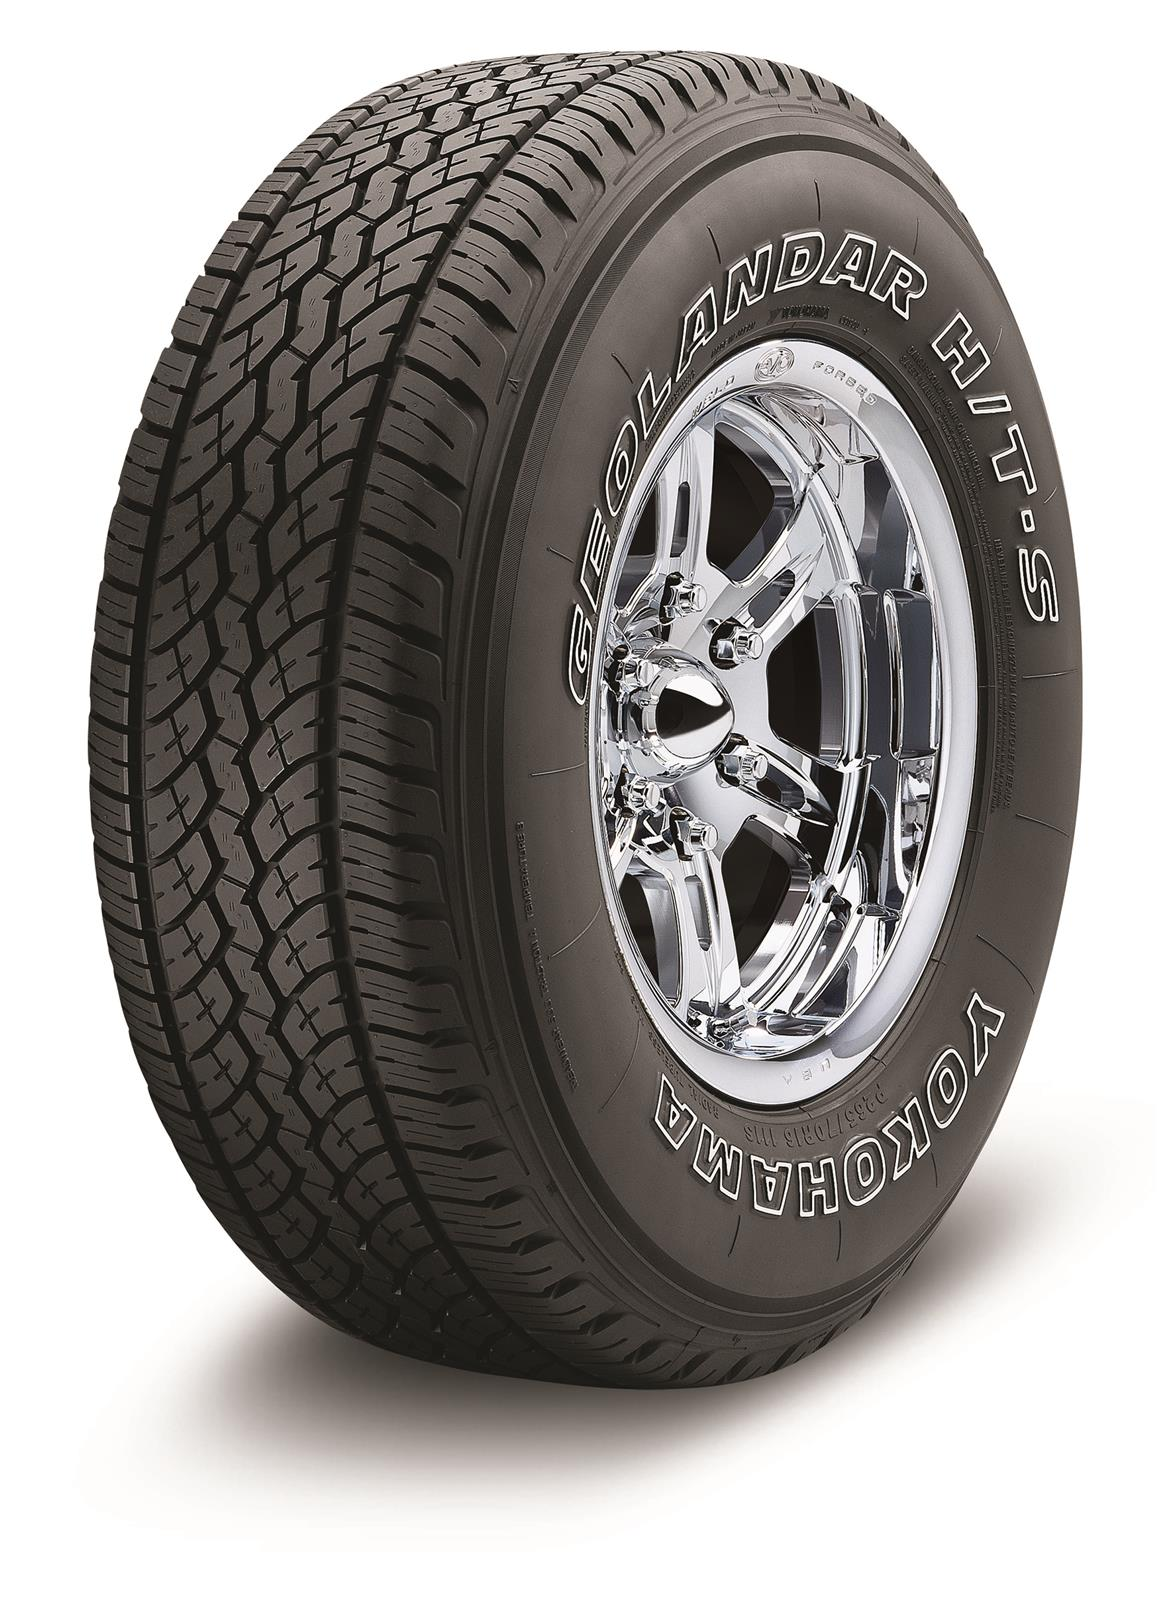 yokohama geolandar h t s tires 05118 free shipping on. Black Bedroom Furniture Sets. Home Design Ideas